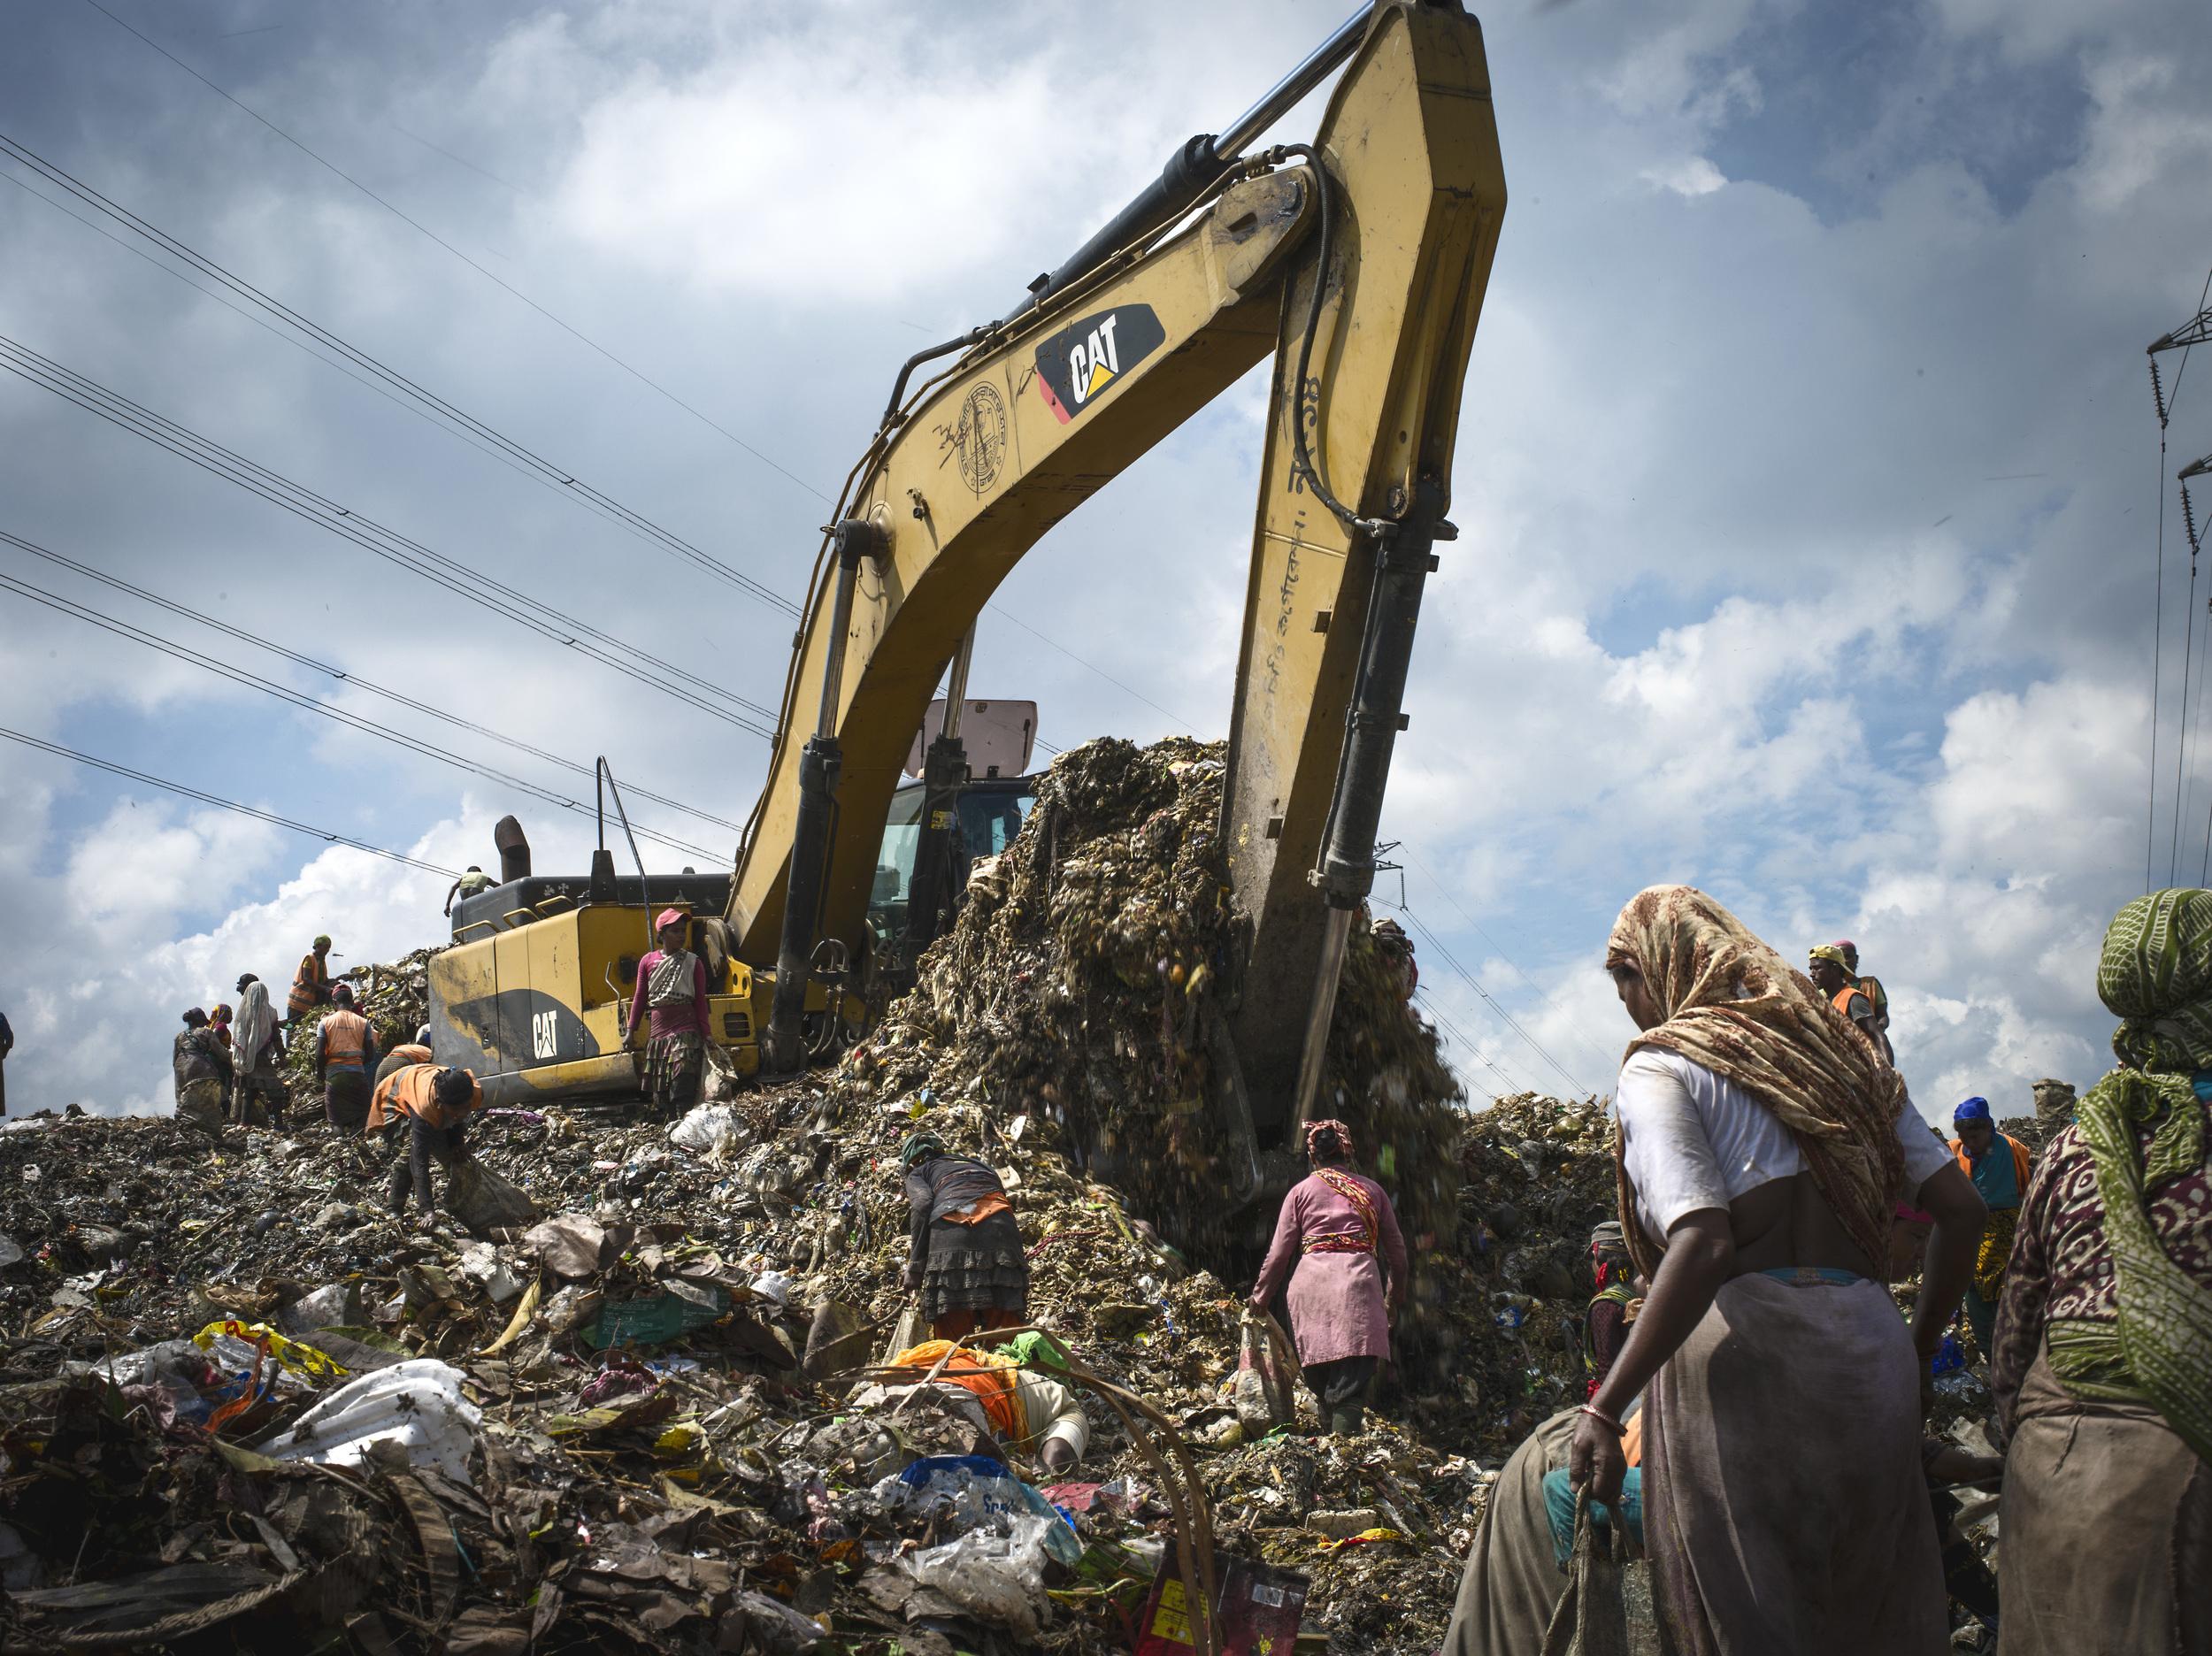 Matuail Landfill in Dhaka, Bangladesh.